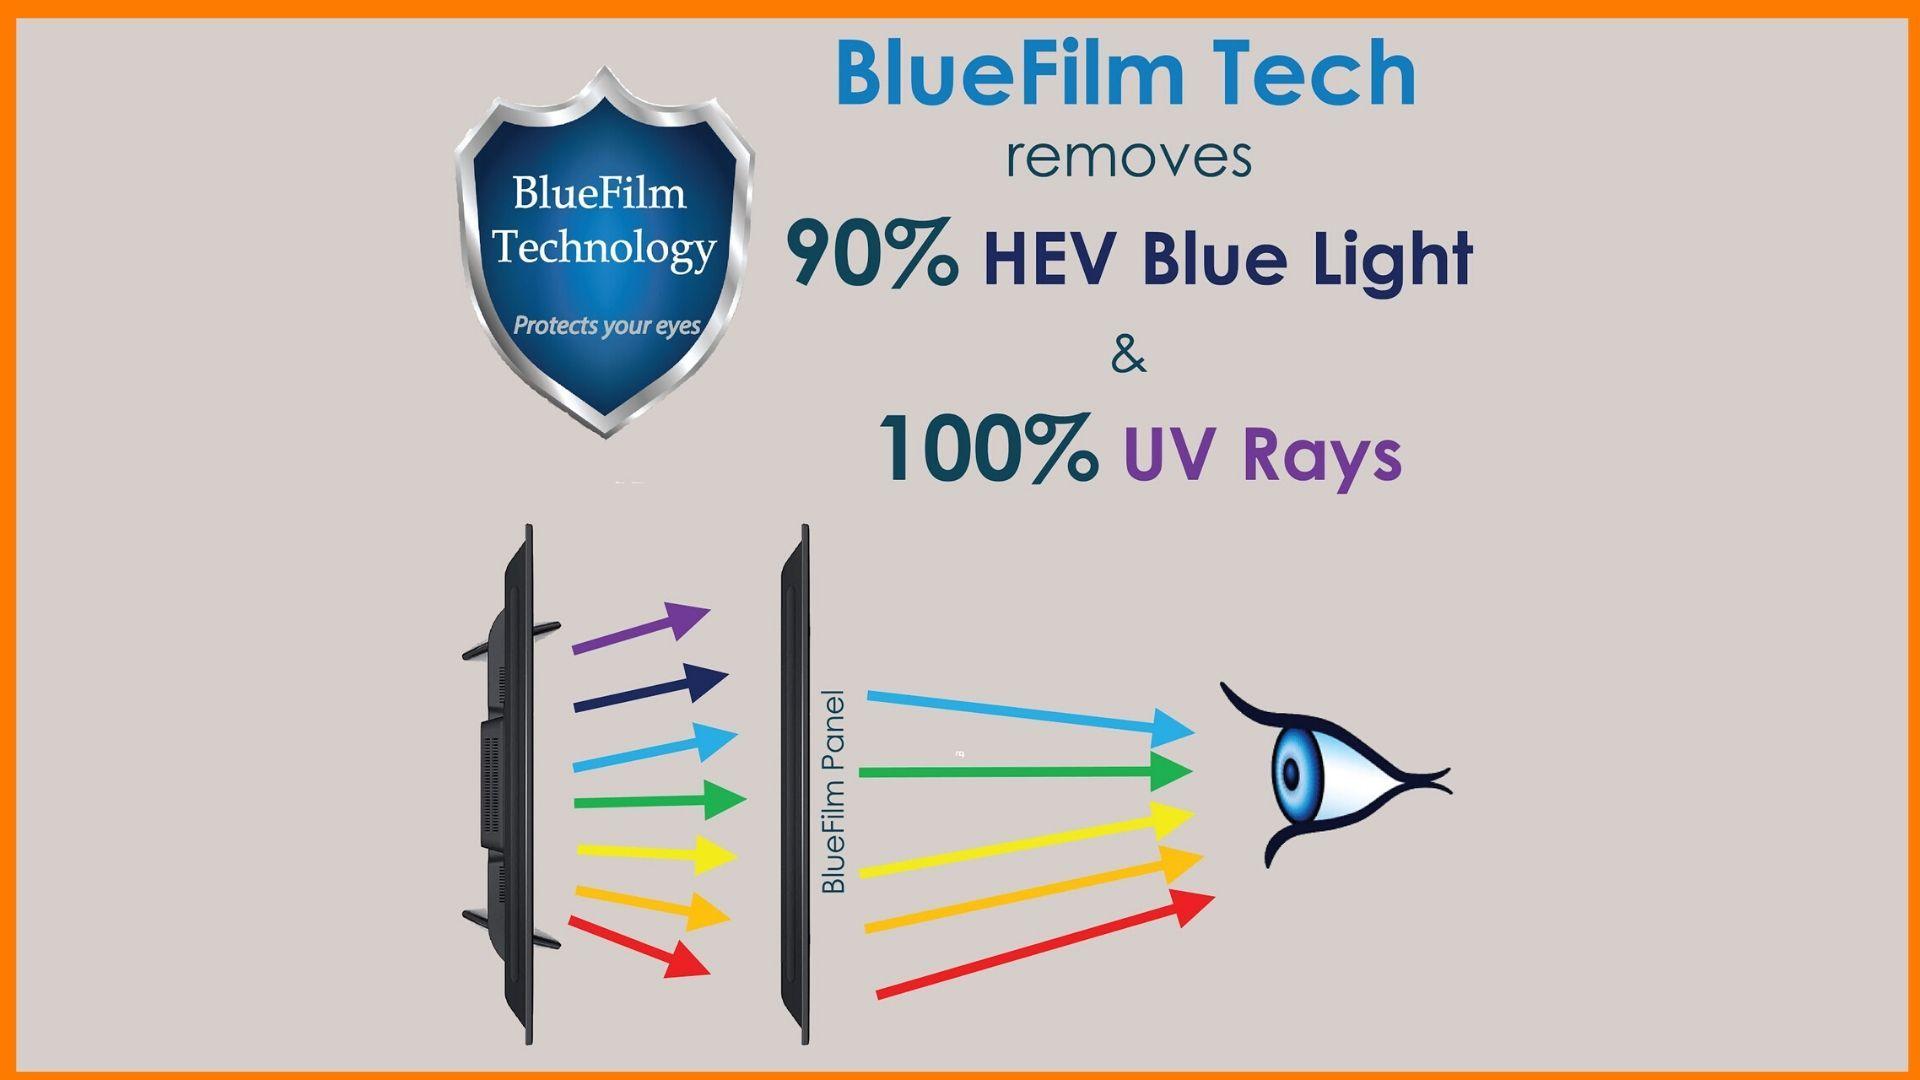 Blue Film Tech